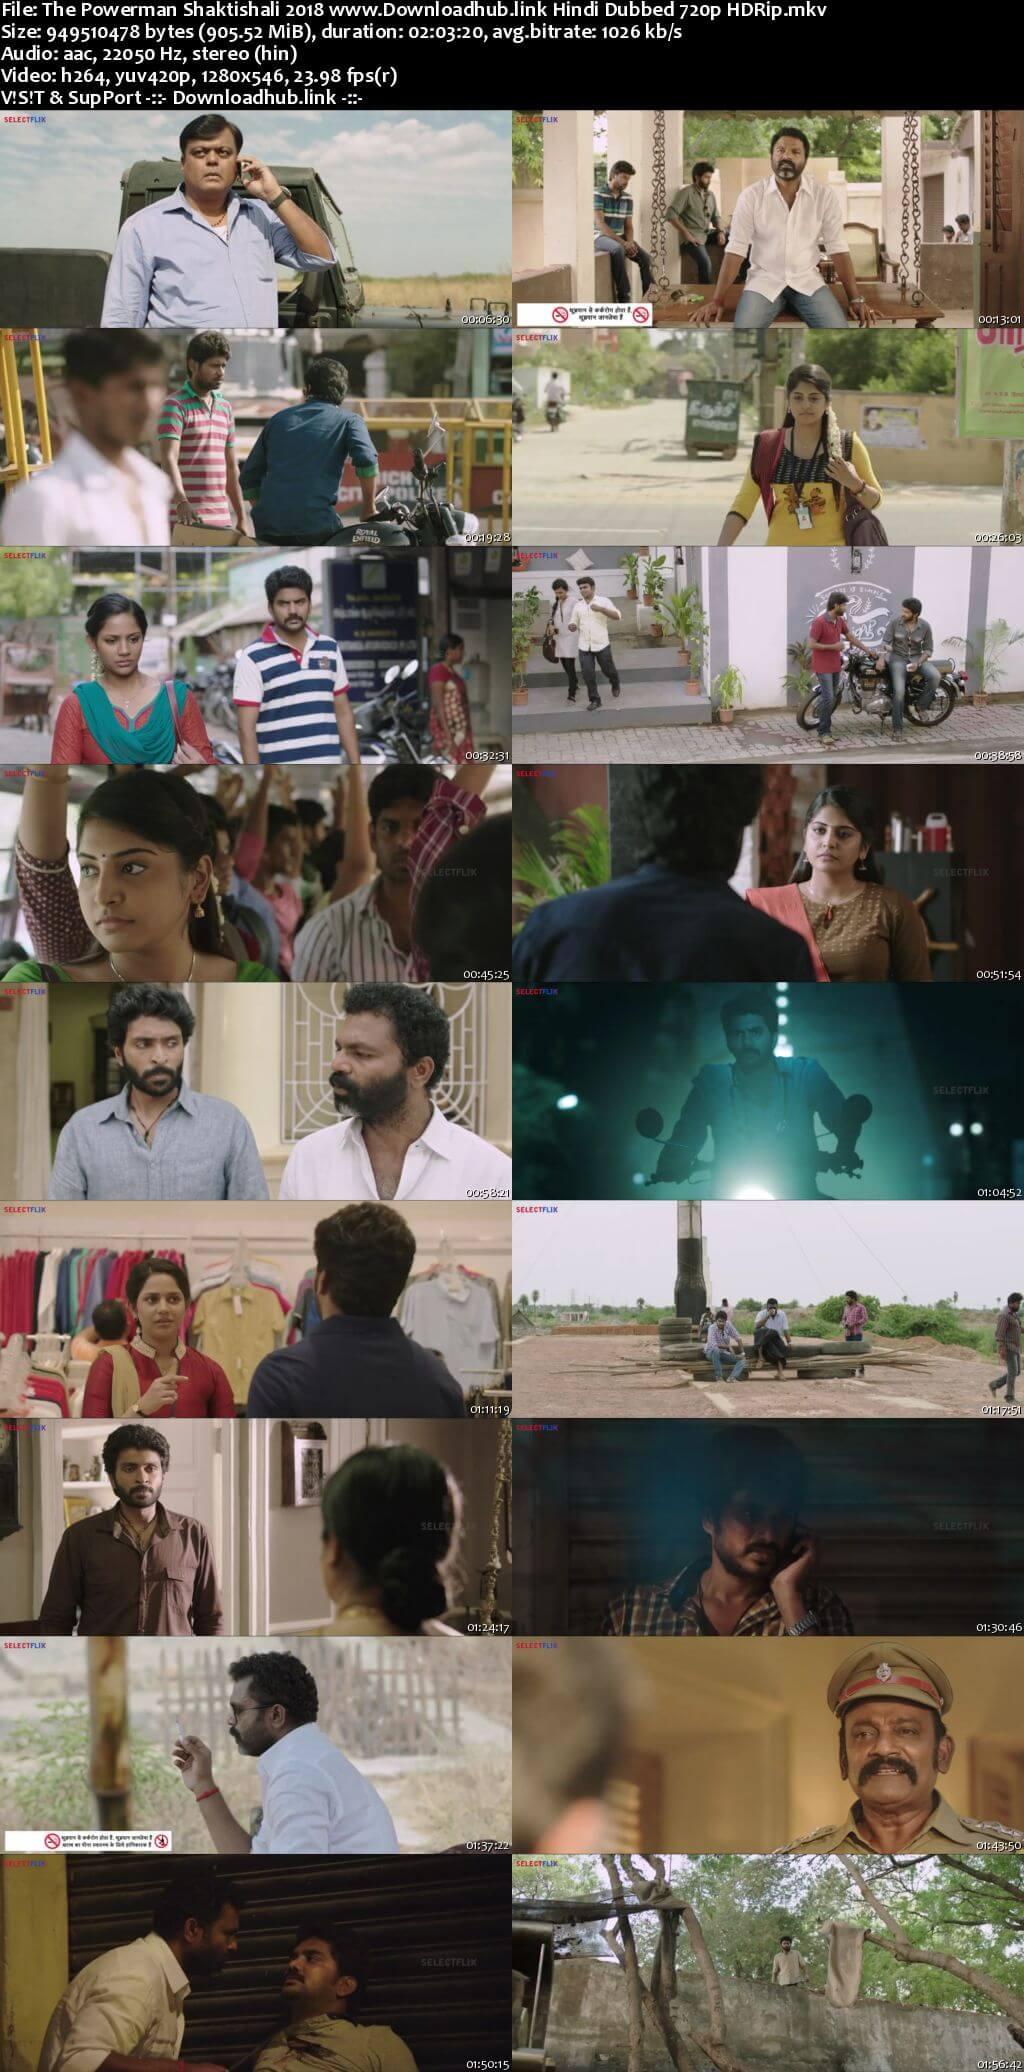 The Powerman Shaktishali 2018 Hindi Dubbed 720p HDRip x264